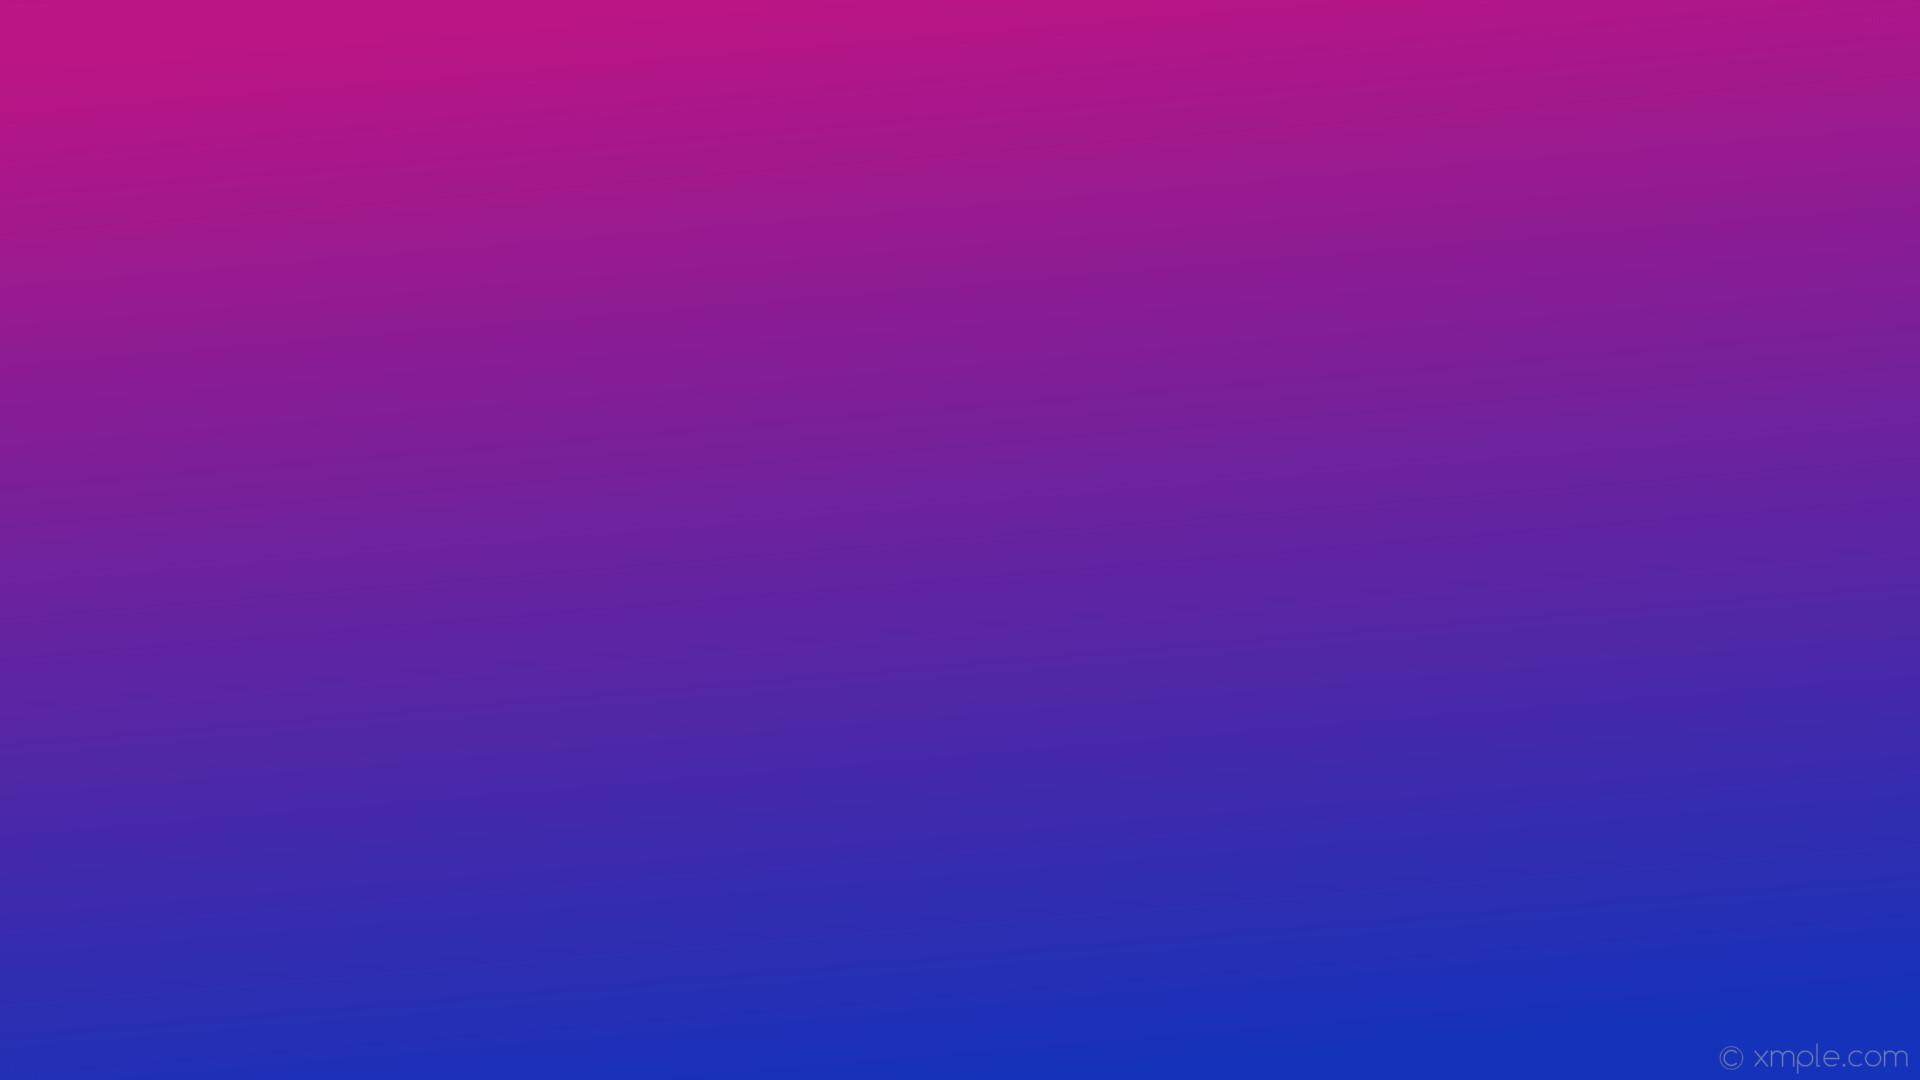 wallpaper linear pink gradient blue #1432ba #ba1485 285°